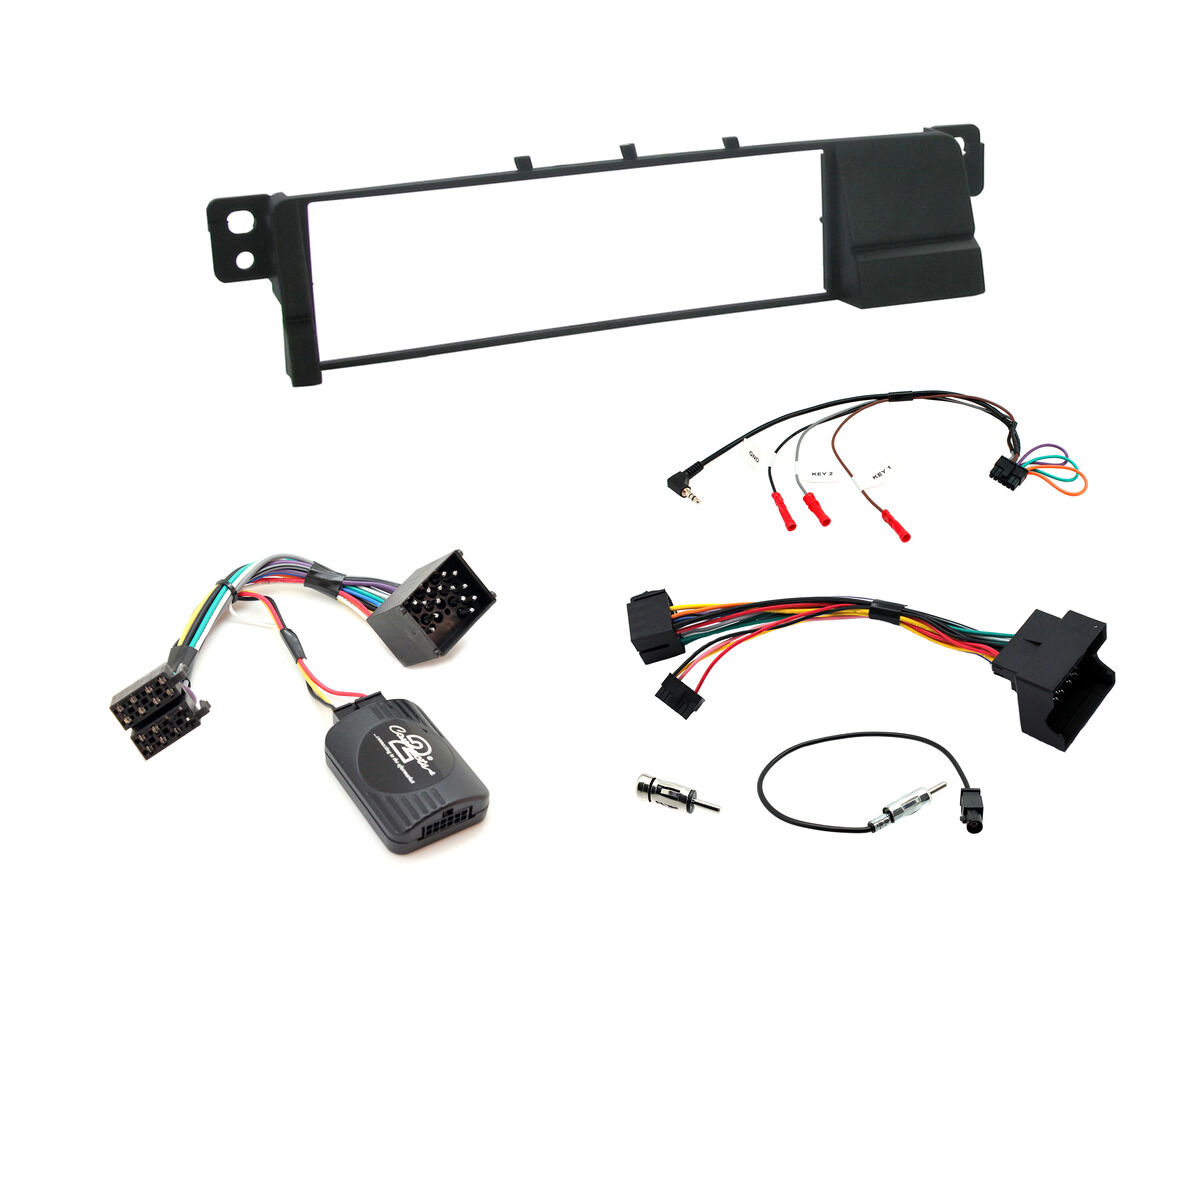 audio wiring kits supercheap auto australia mega audio wiring kit audio wiring kit [ 1200 x 1200 Pixel ]